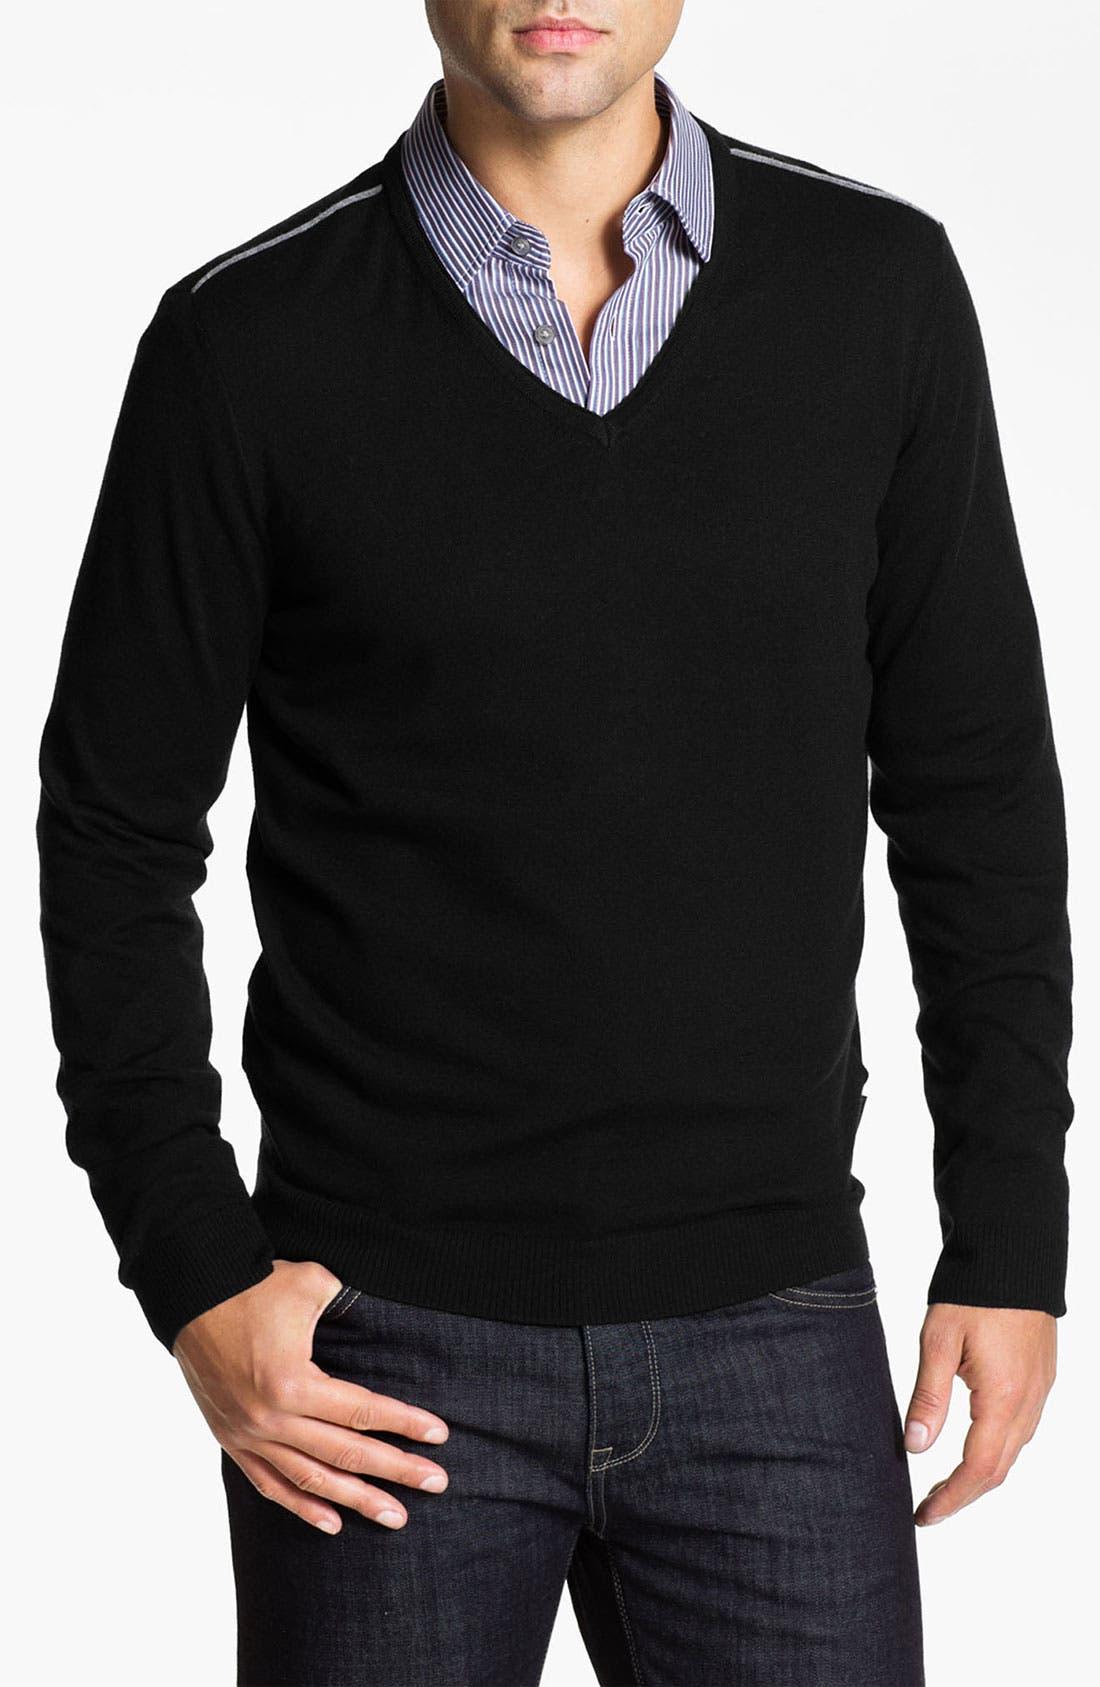 Main Image - BOSS Black 'Lukas' V-Neck Wool Blend Sweater